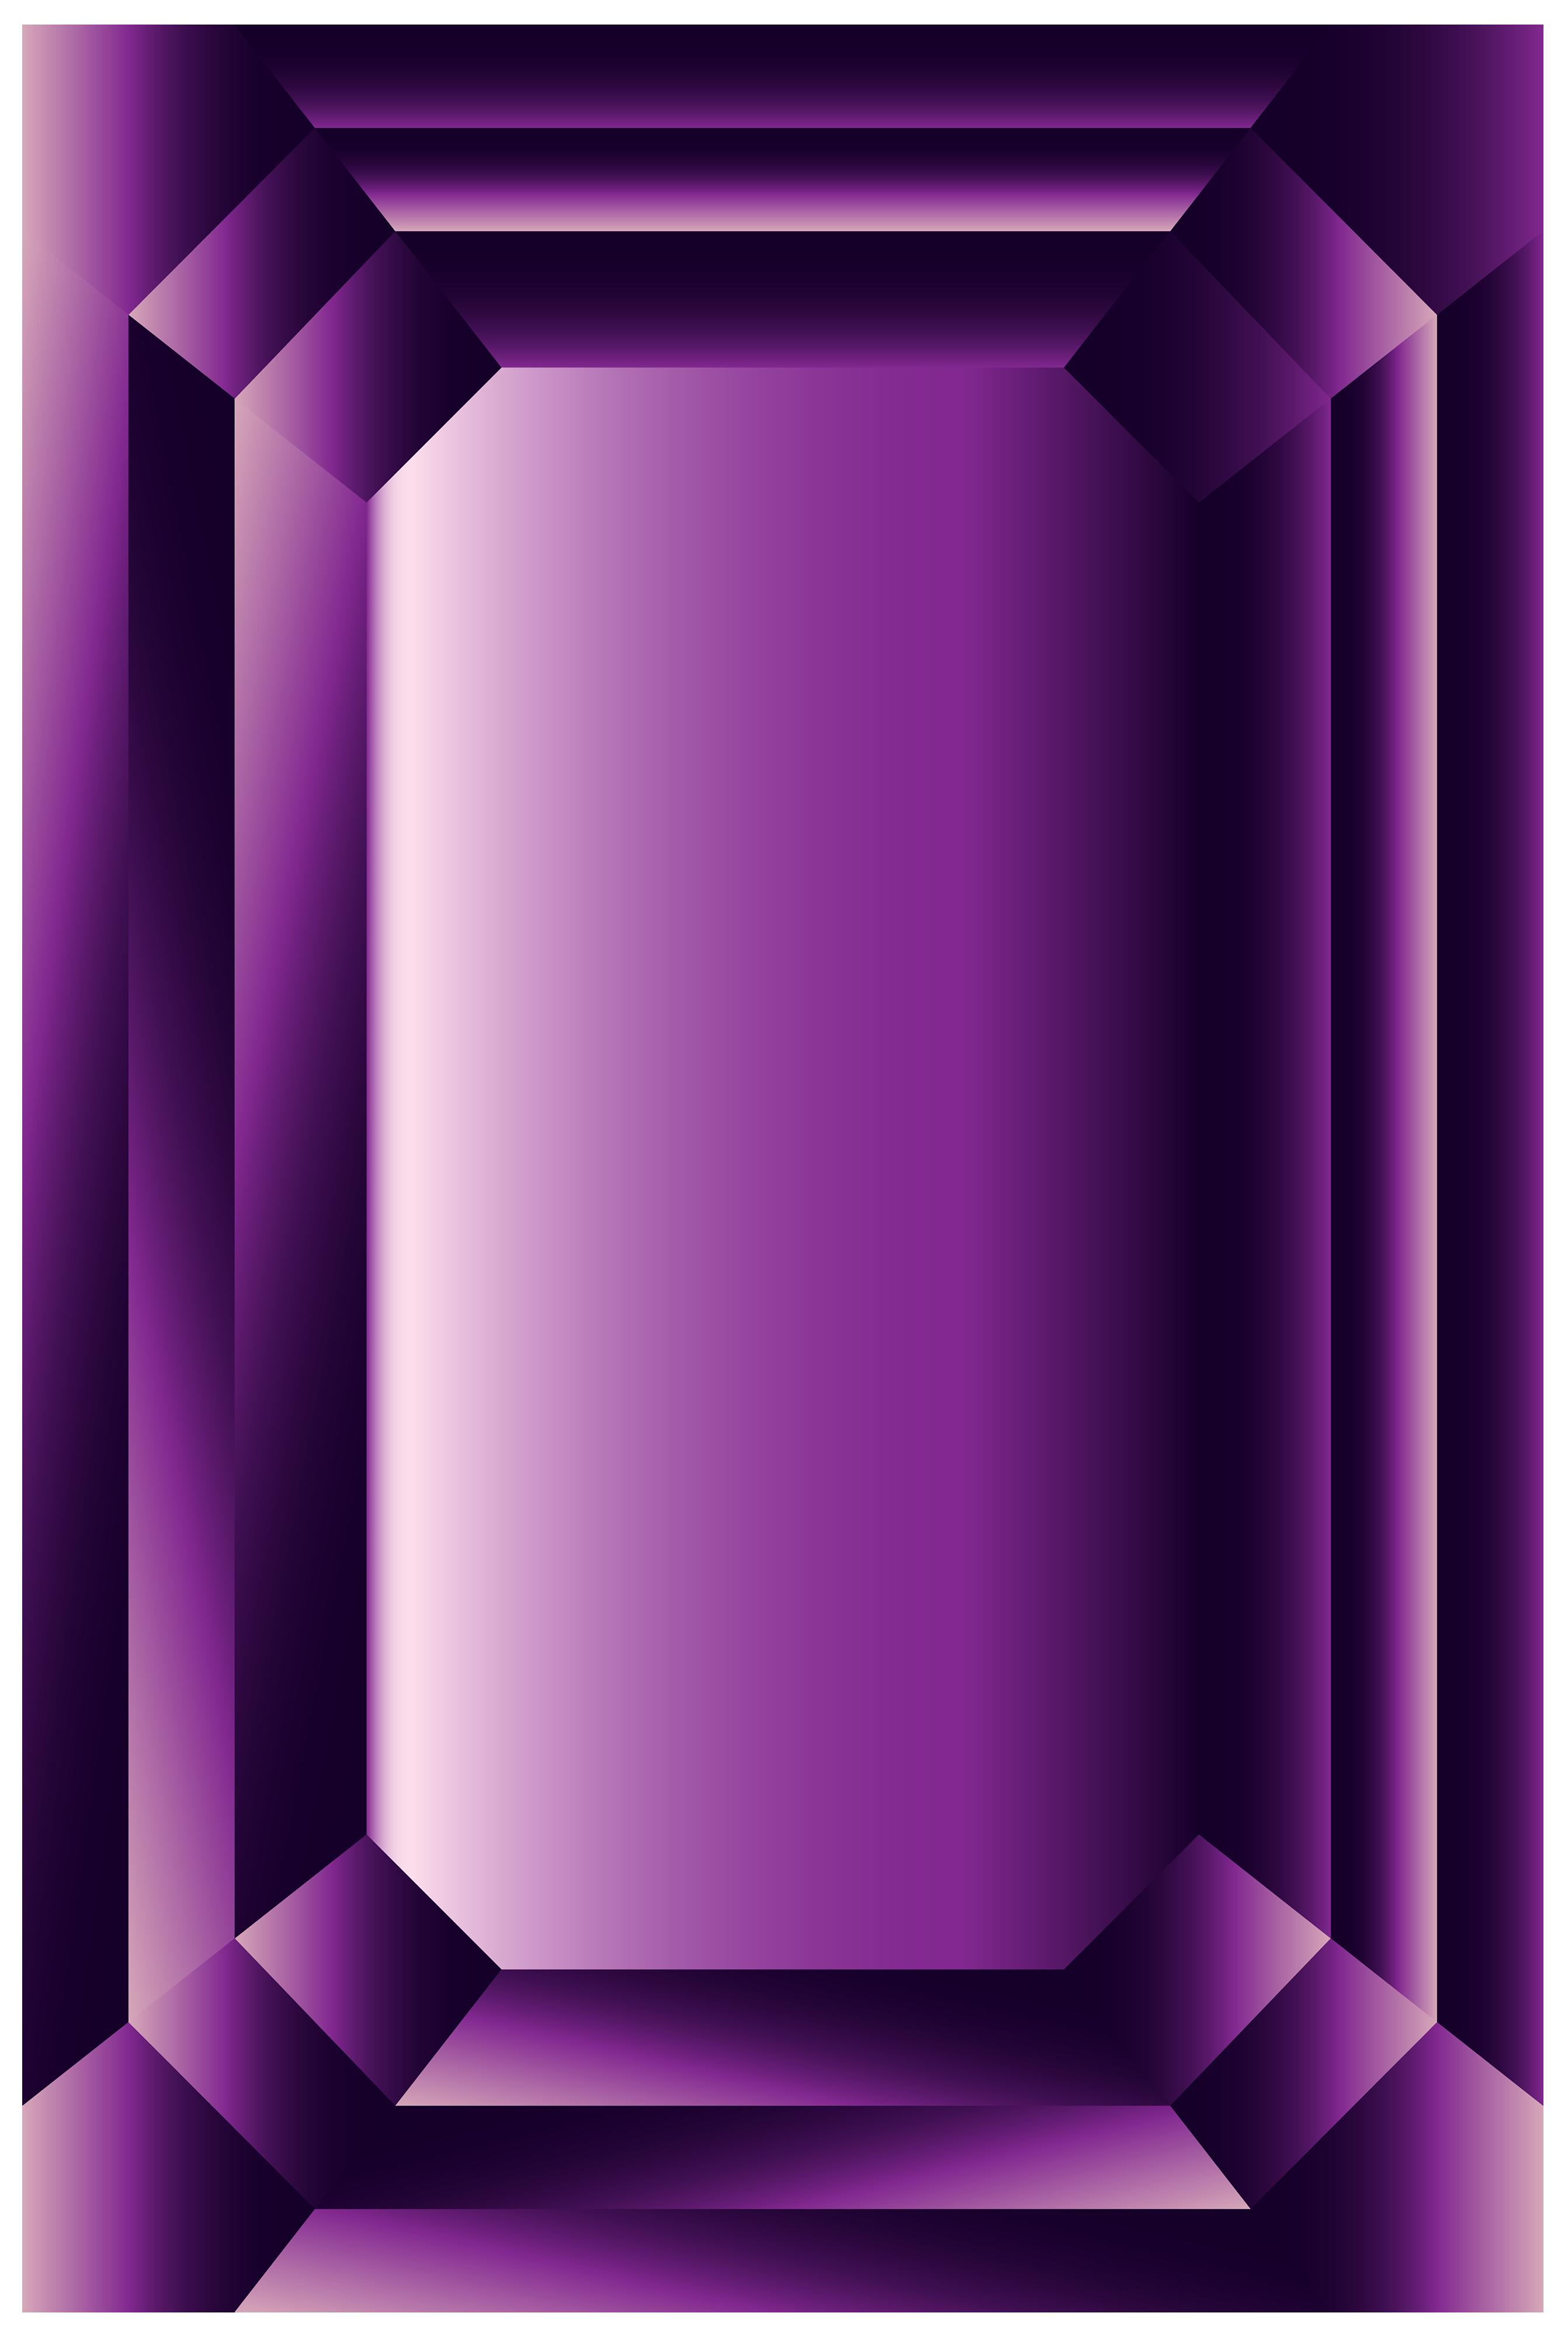 Clipart amethyst.